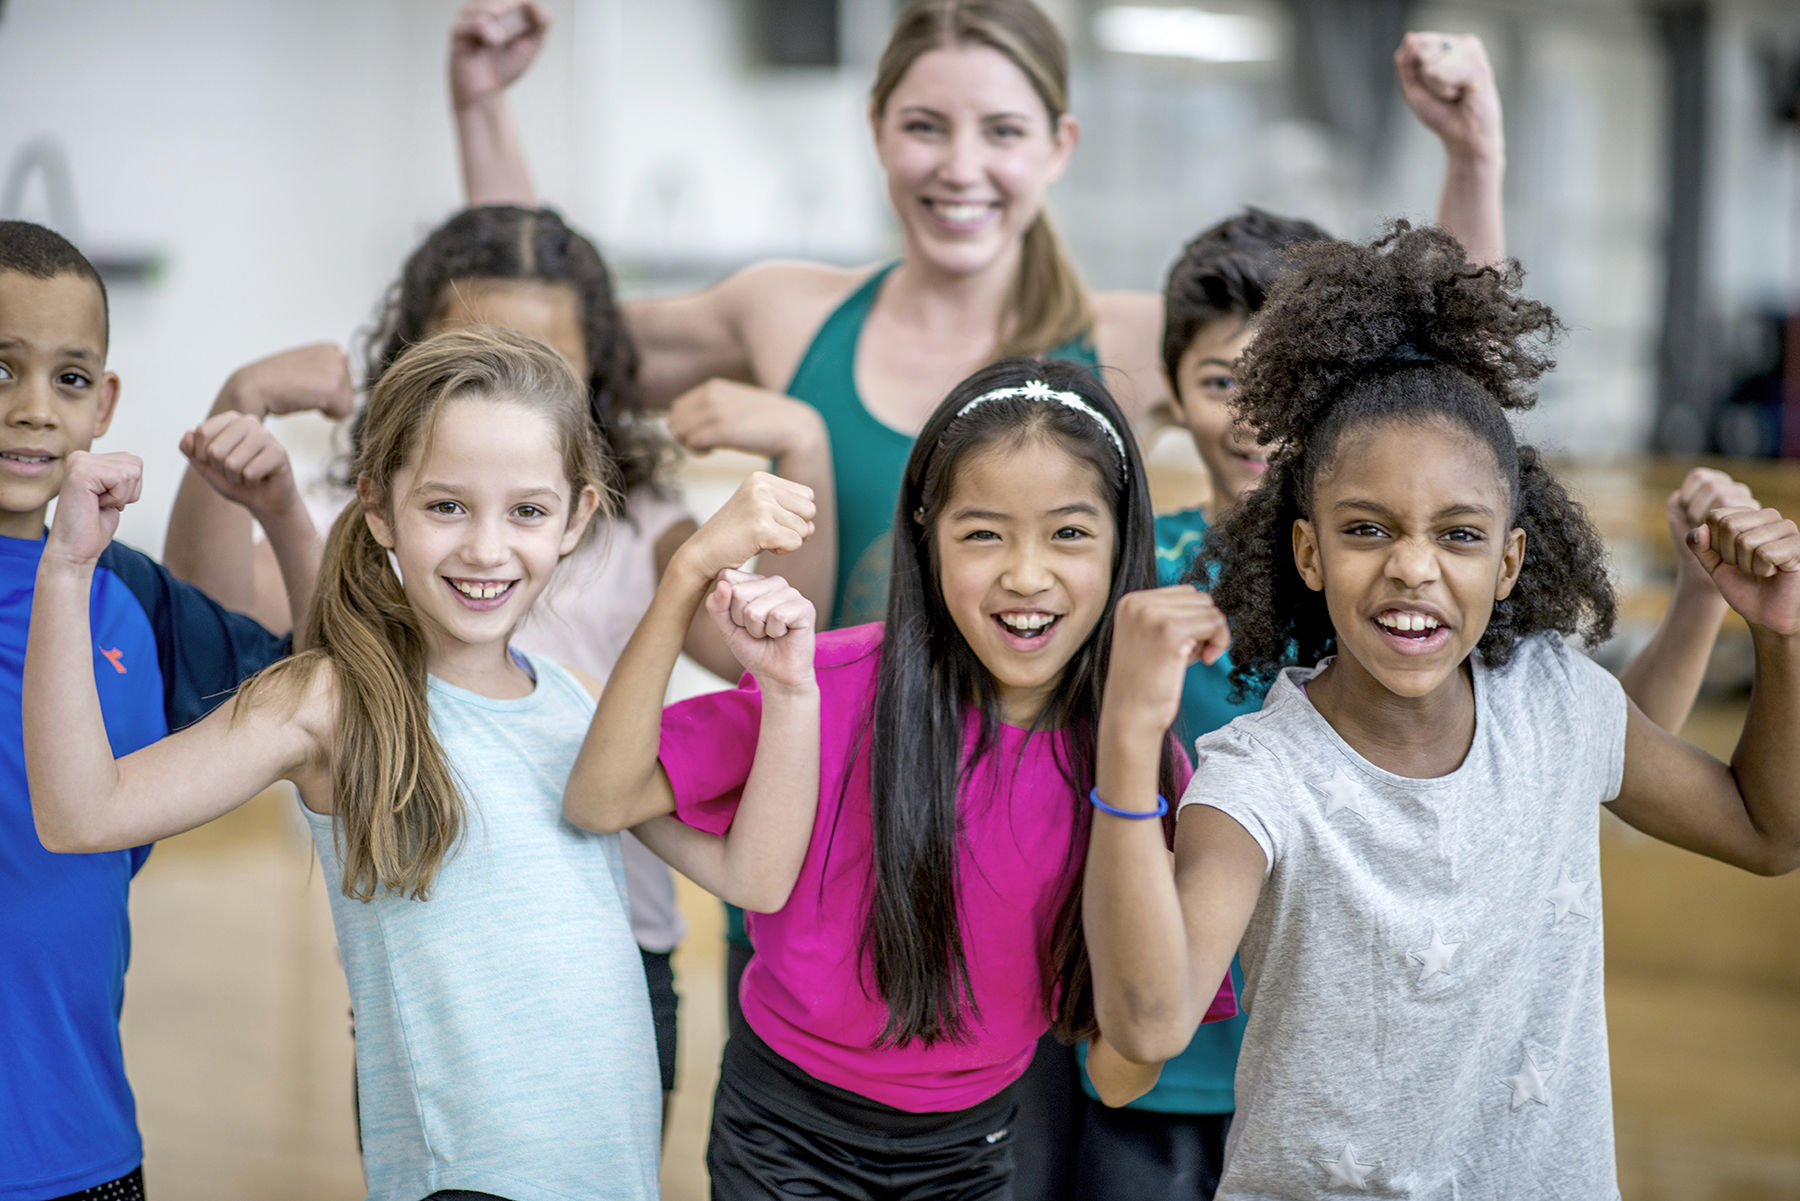 YMCA Healthy Kids Day in The GTA #HealthyKidsDay #YMCAGTA